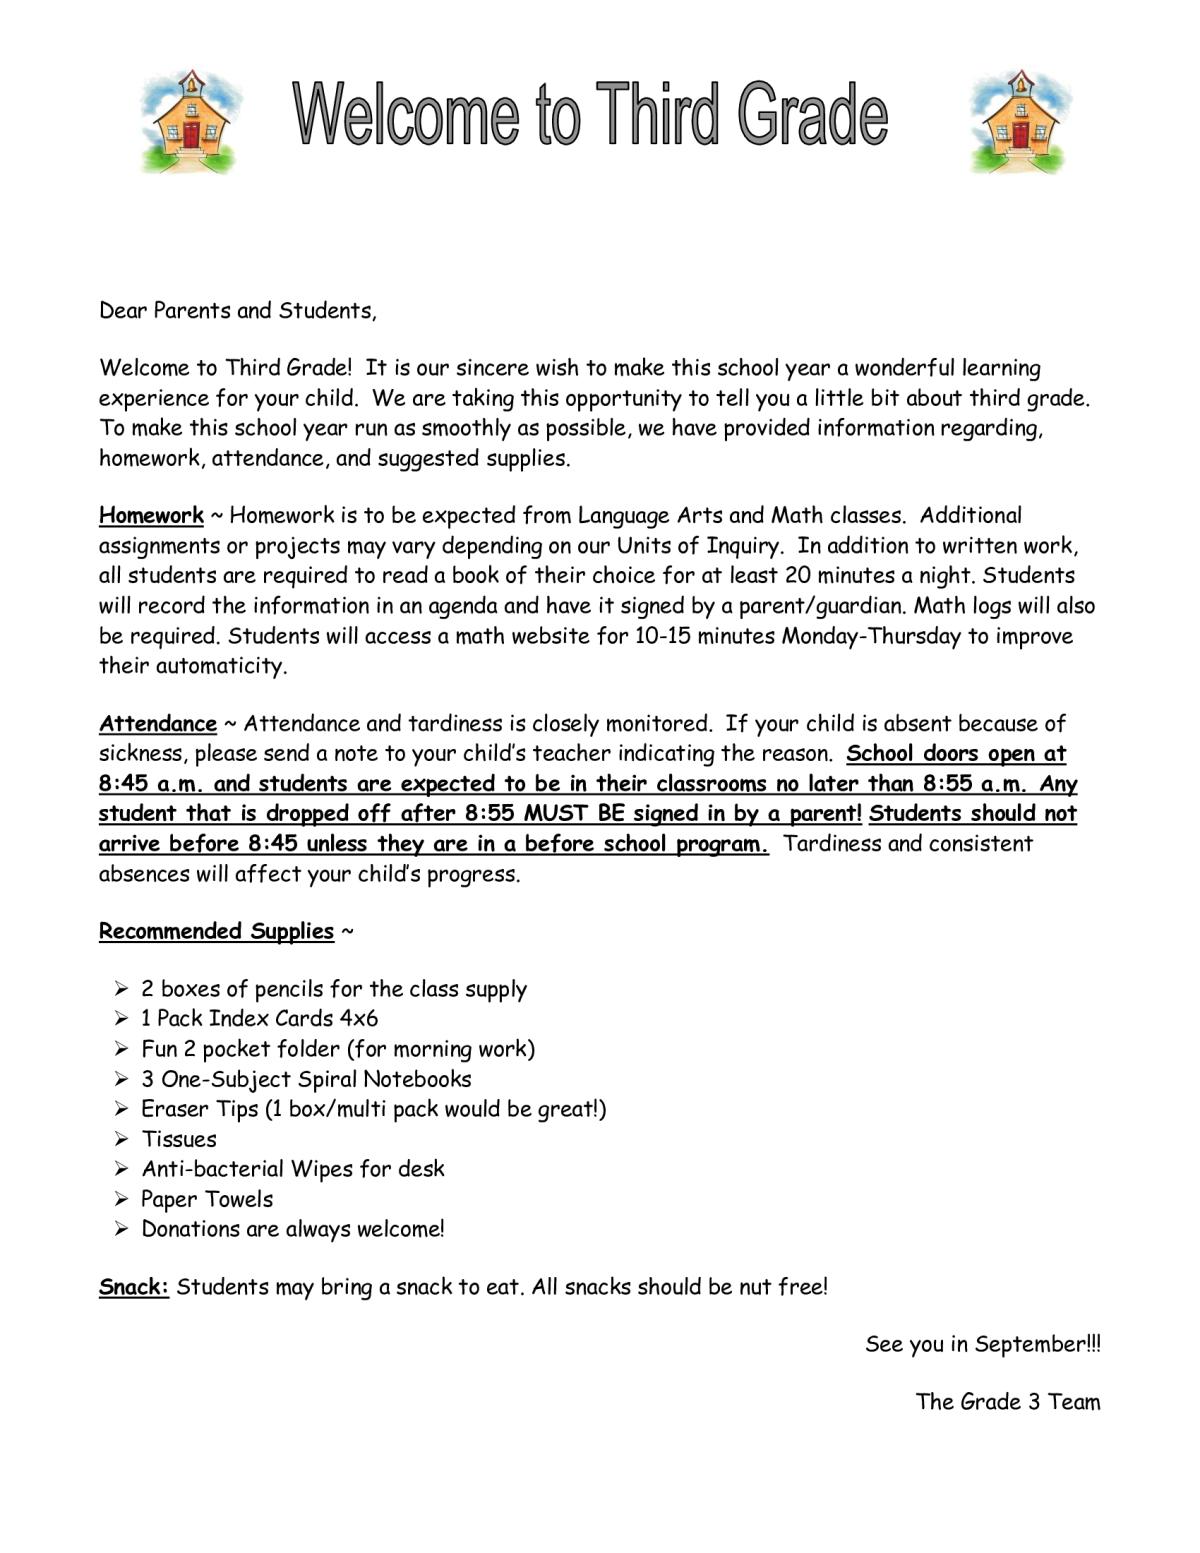 SchoolPeachjar - Page 119